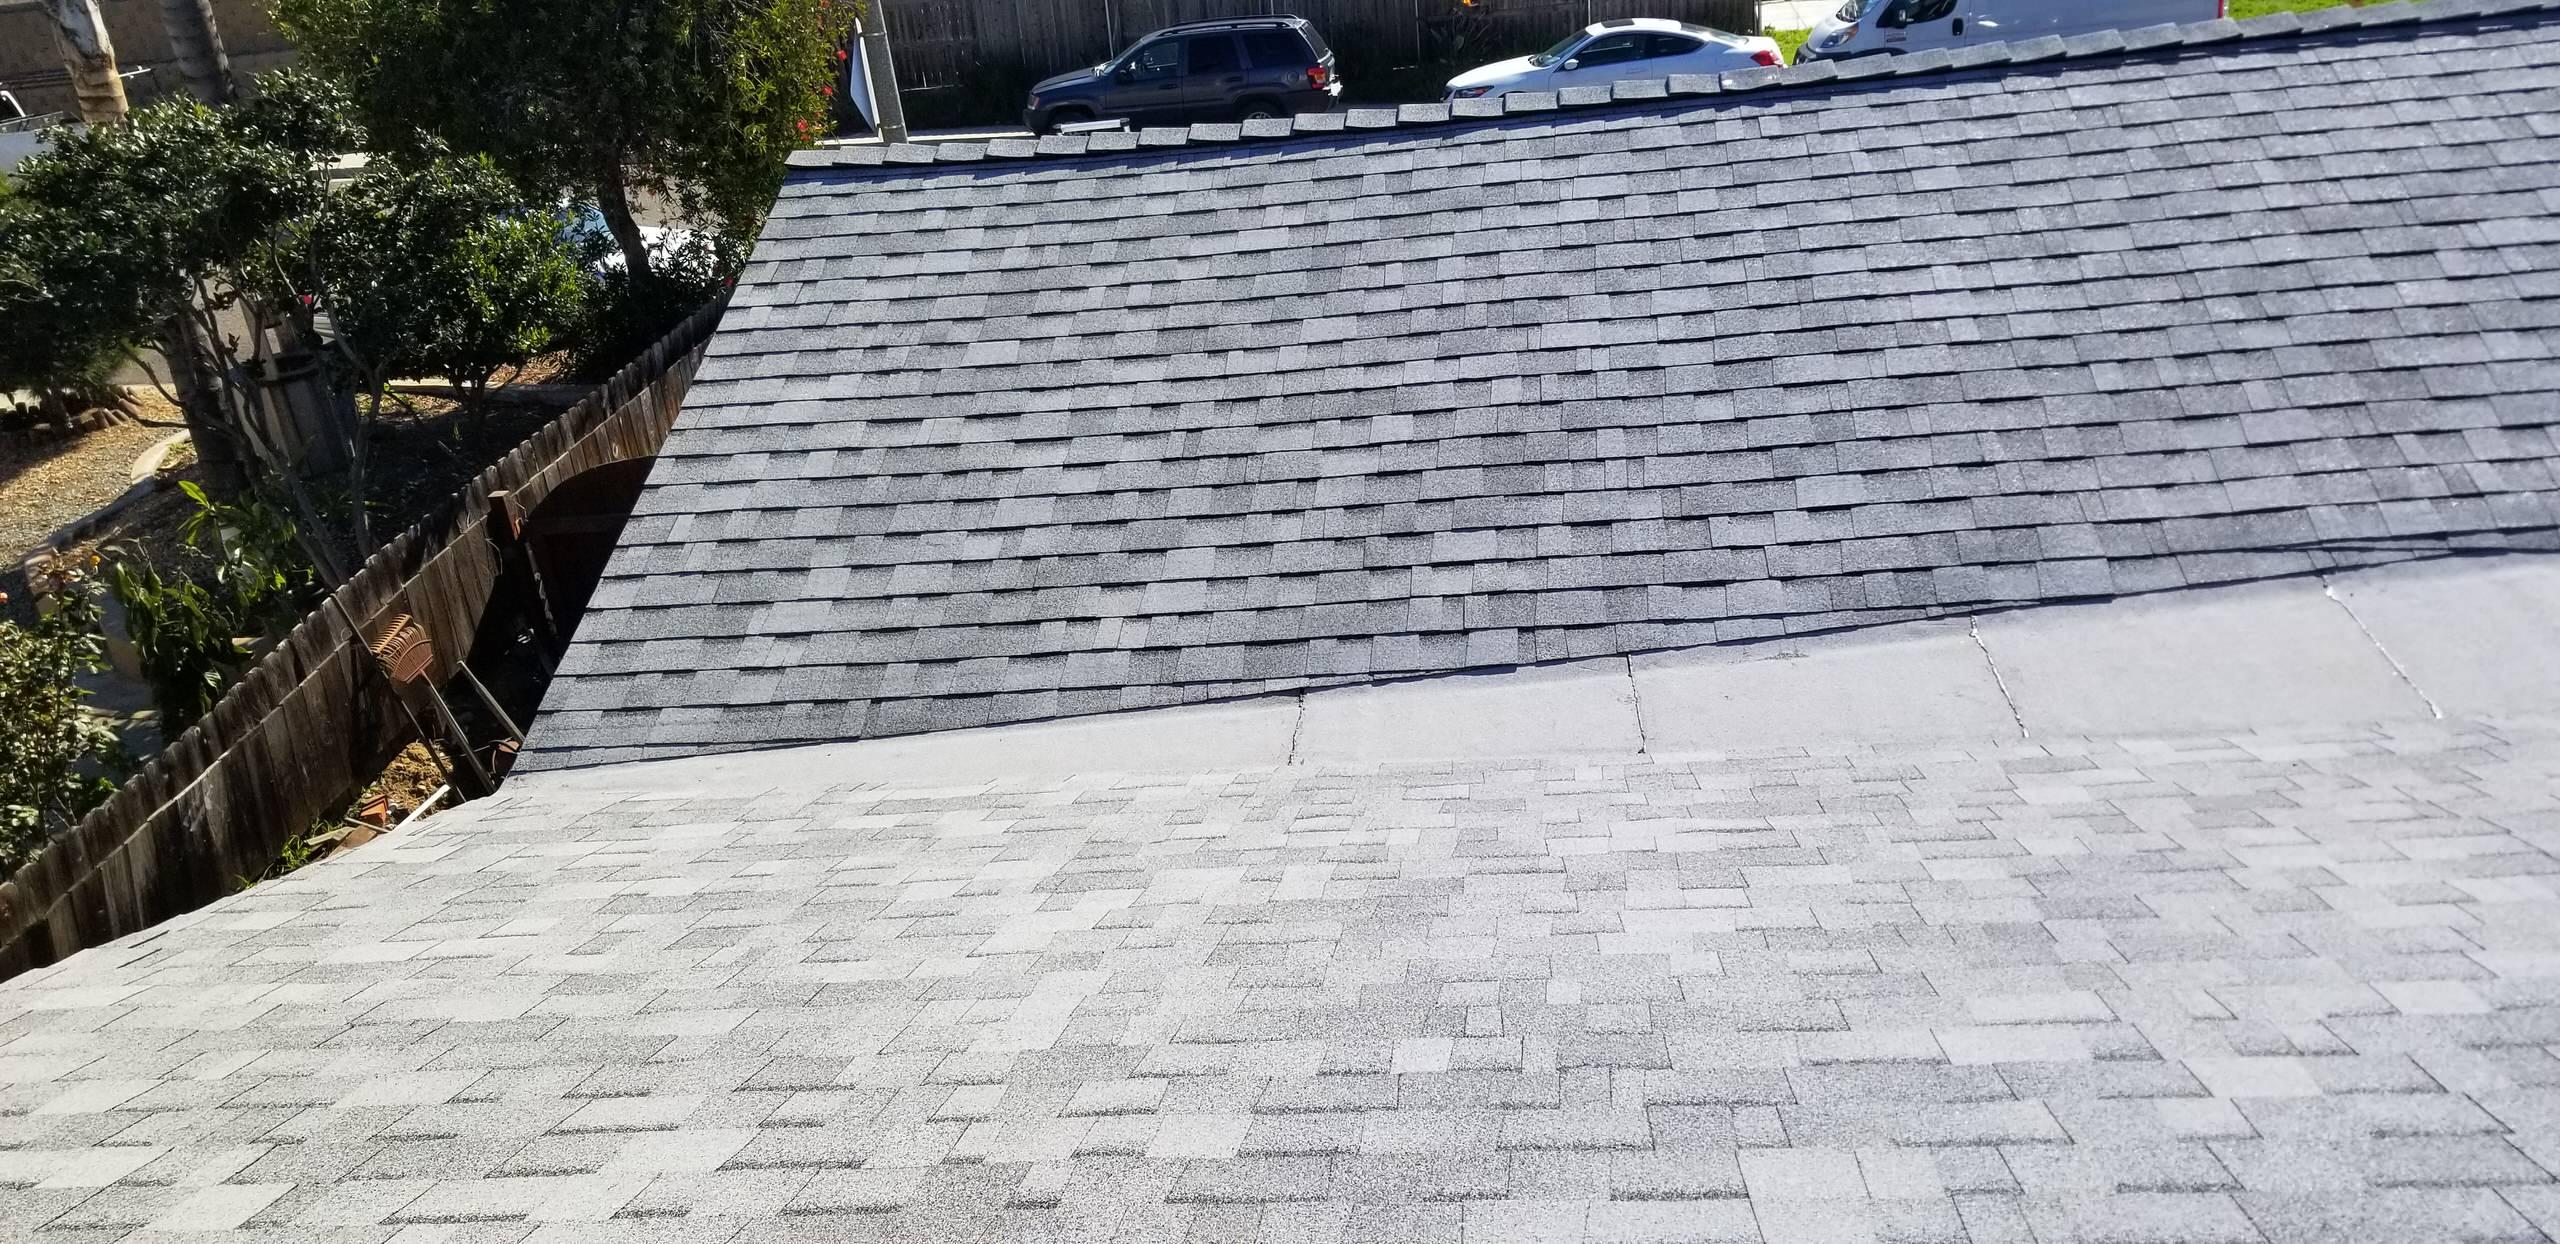 Marcelino - Roof